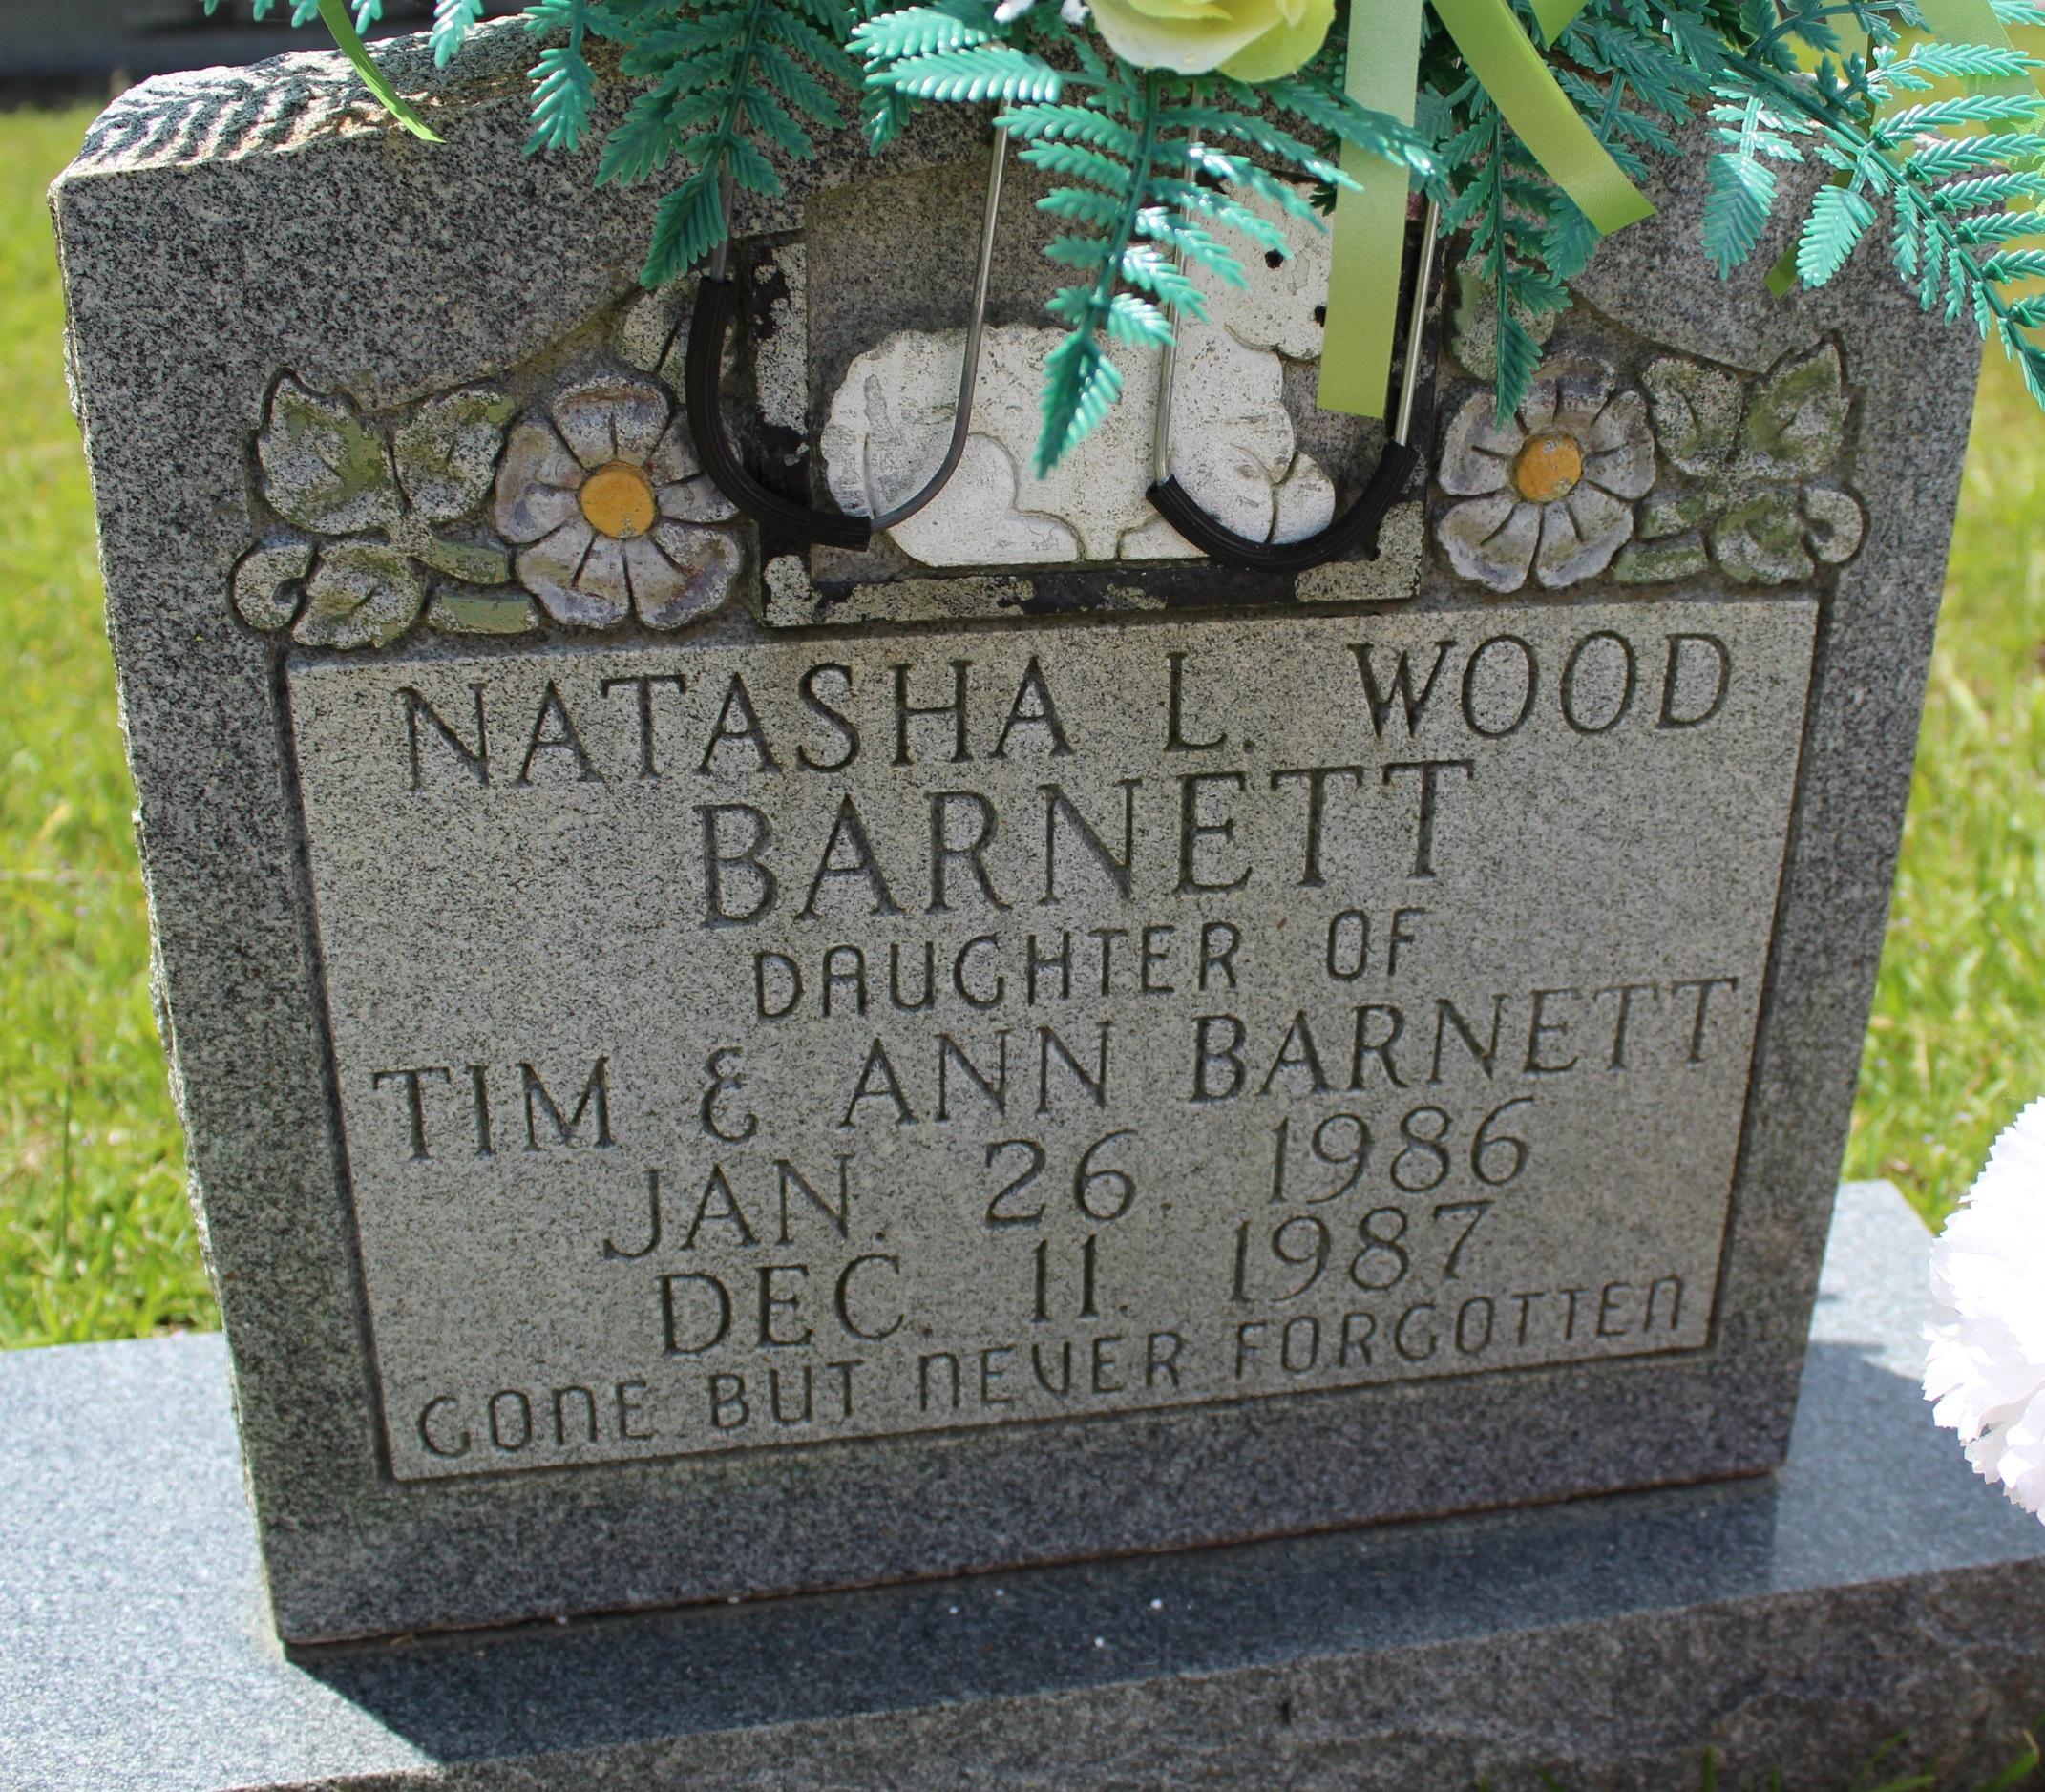 Natasha Liegh Barnett